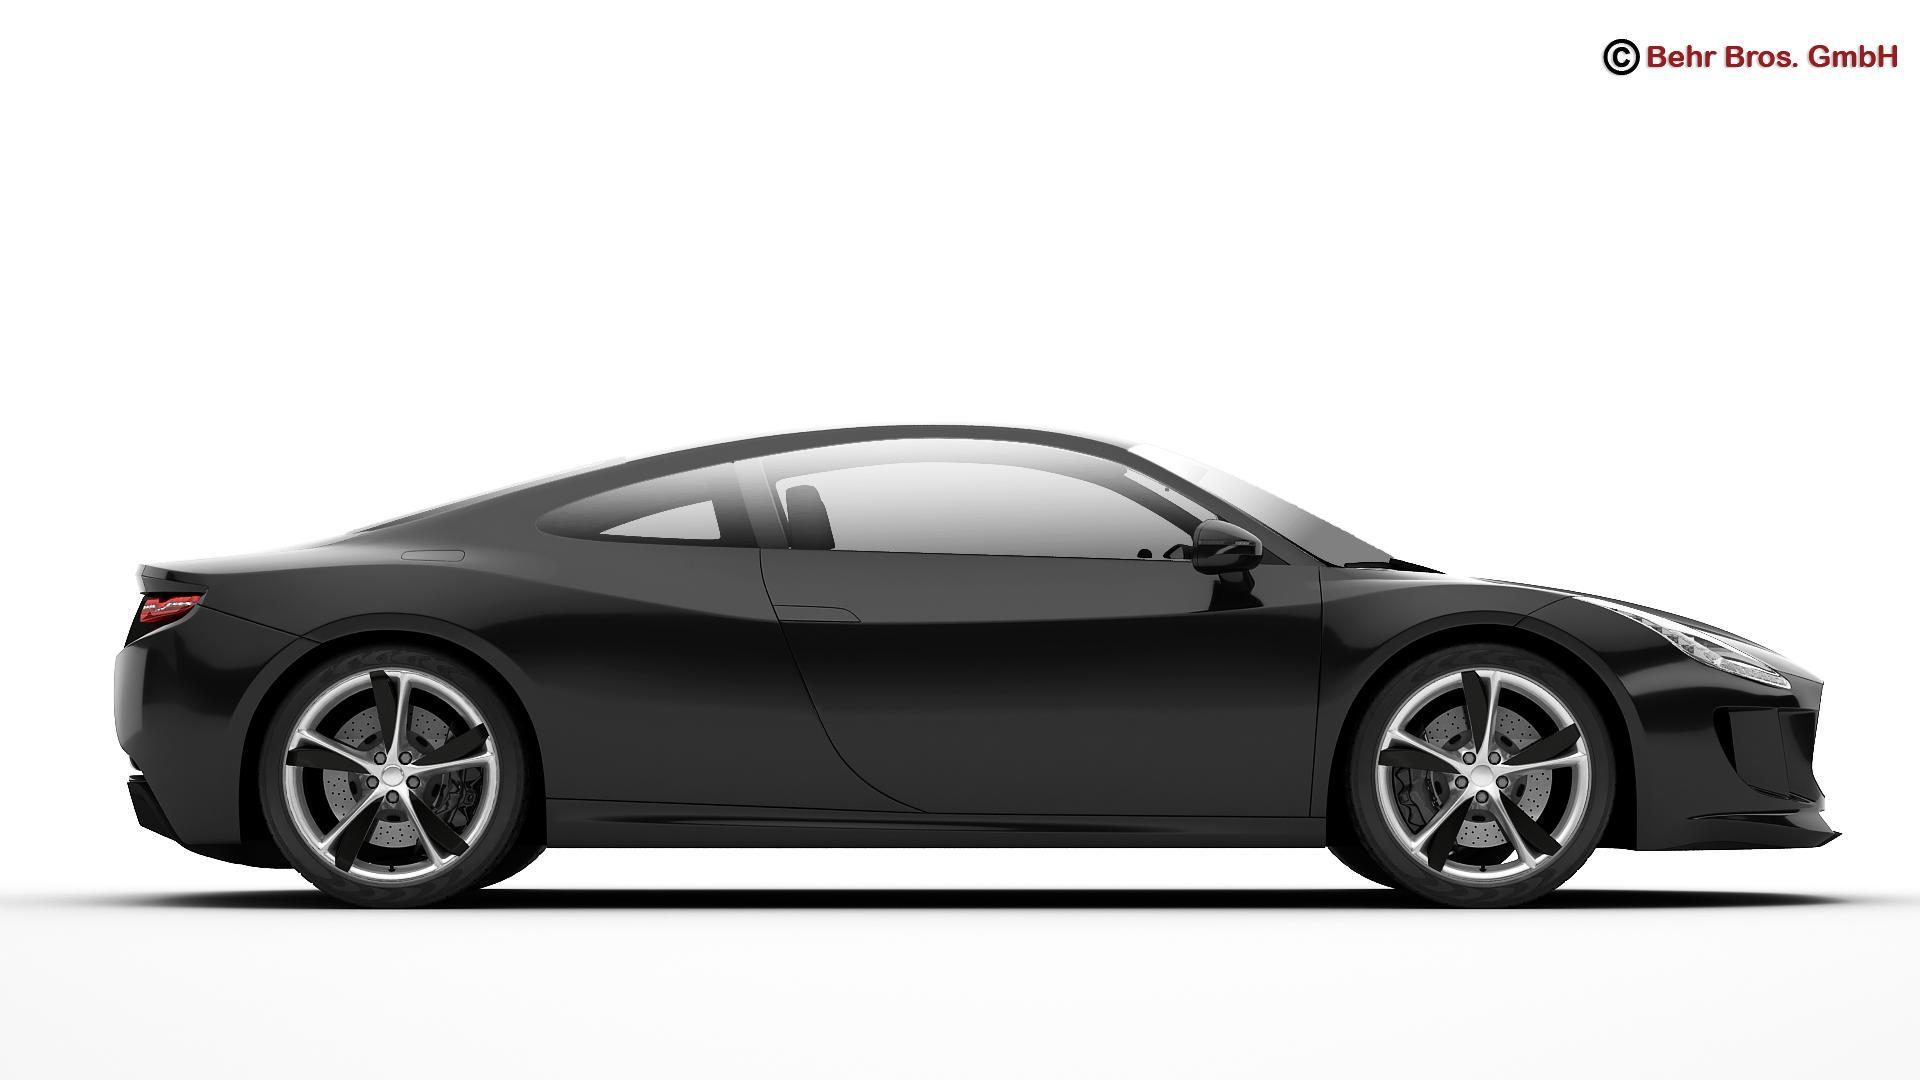 generic sports car 3d model 3ds max fbx c4d lwo ma mb obj 160525